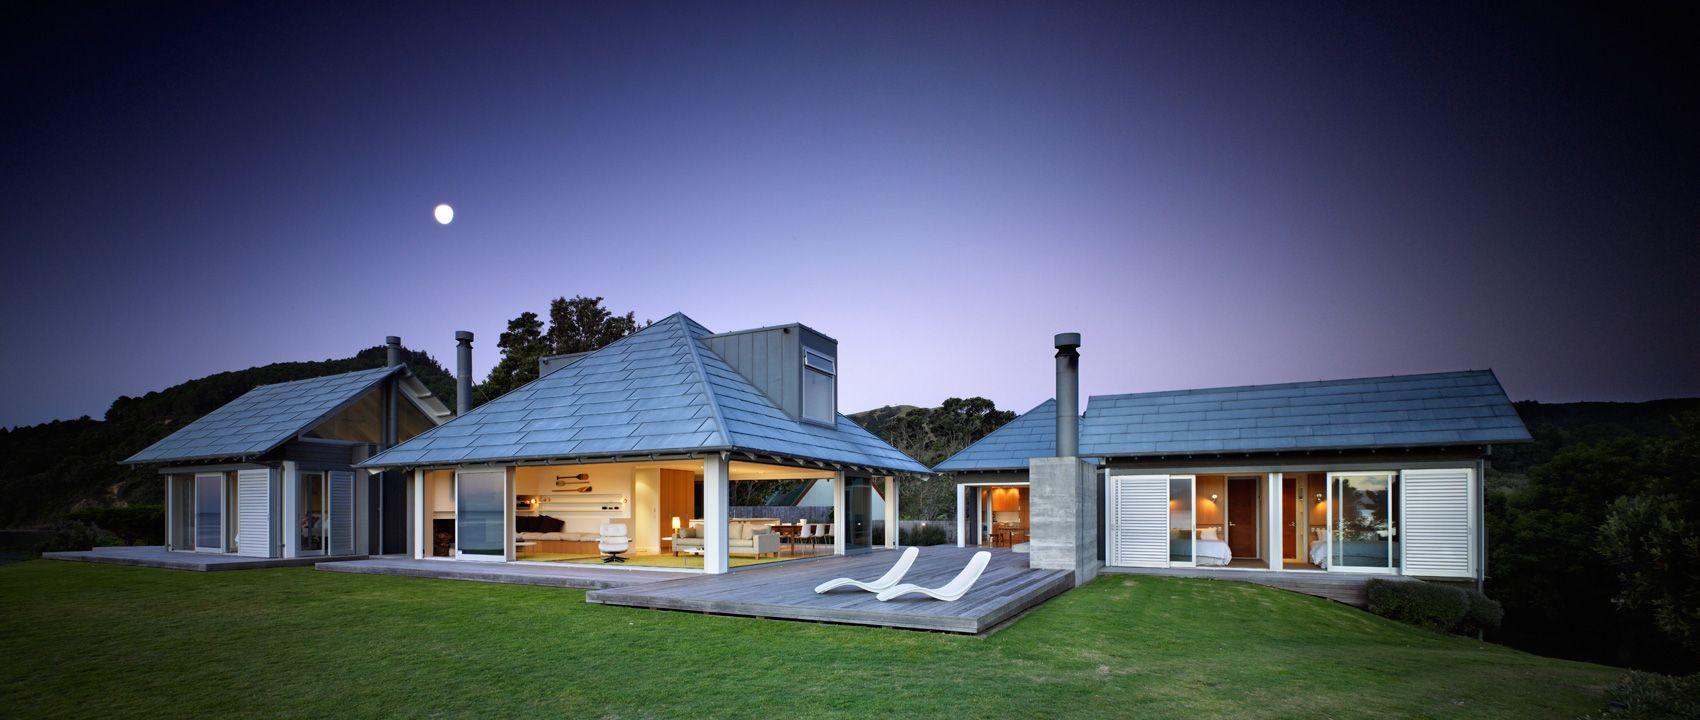 innovative home designs. innovative coastal house design separate pavilions  looks like someone else had my idea